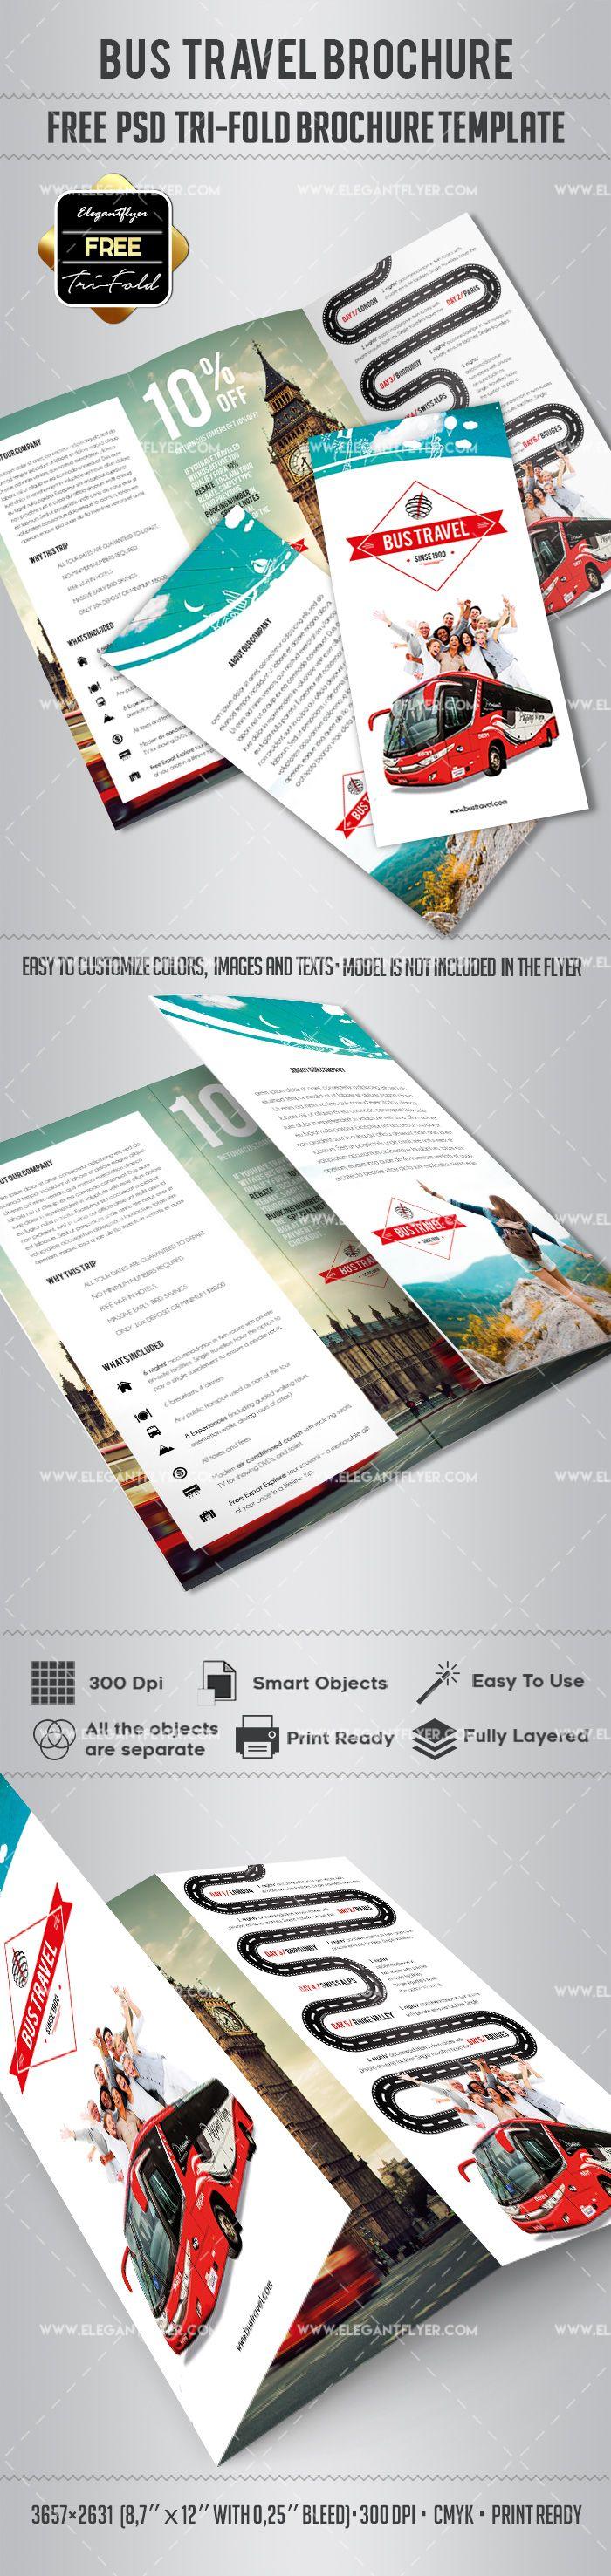 Free Bus Travel Tri Fold Psd Brochure Template Pinterest Bus